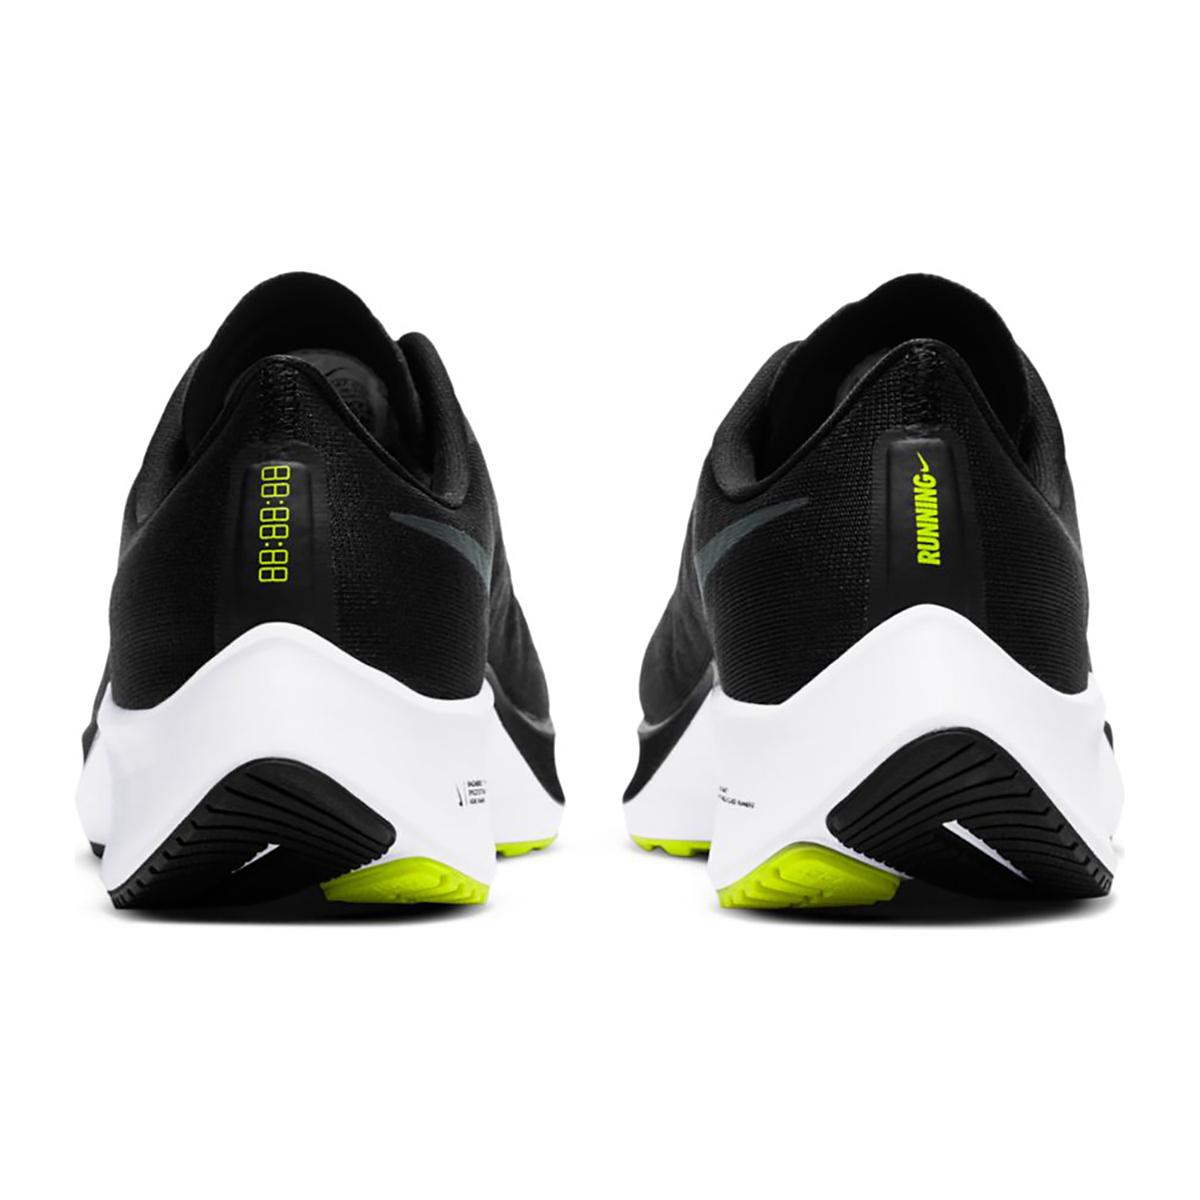 Women's Nike Nike Air Zoom Pegasus 37 Running Shoe - Color: Black/Anthracite/Dark Raisin/White - Size: 5 - Width: Regular, Black/Anthracite/Dark Raisin/White, large, image 4